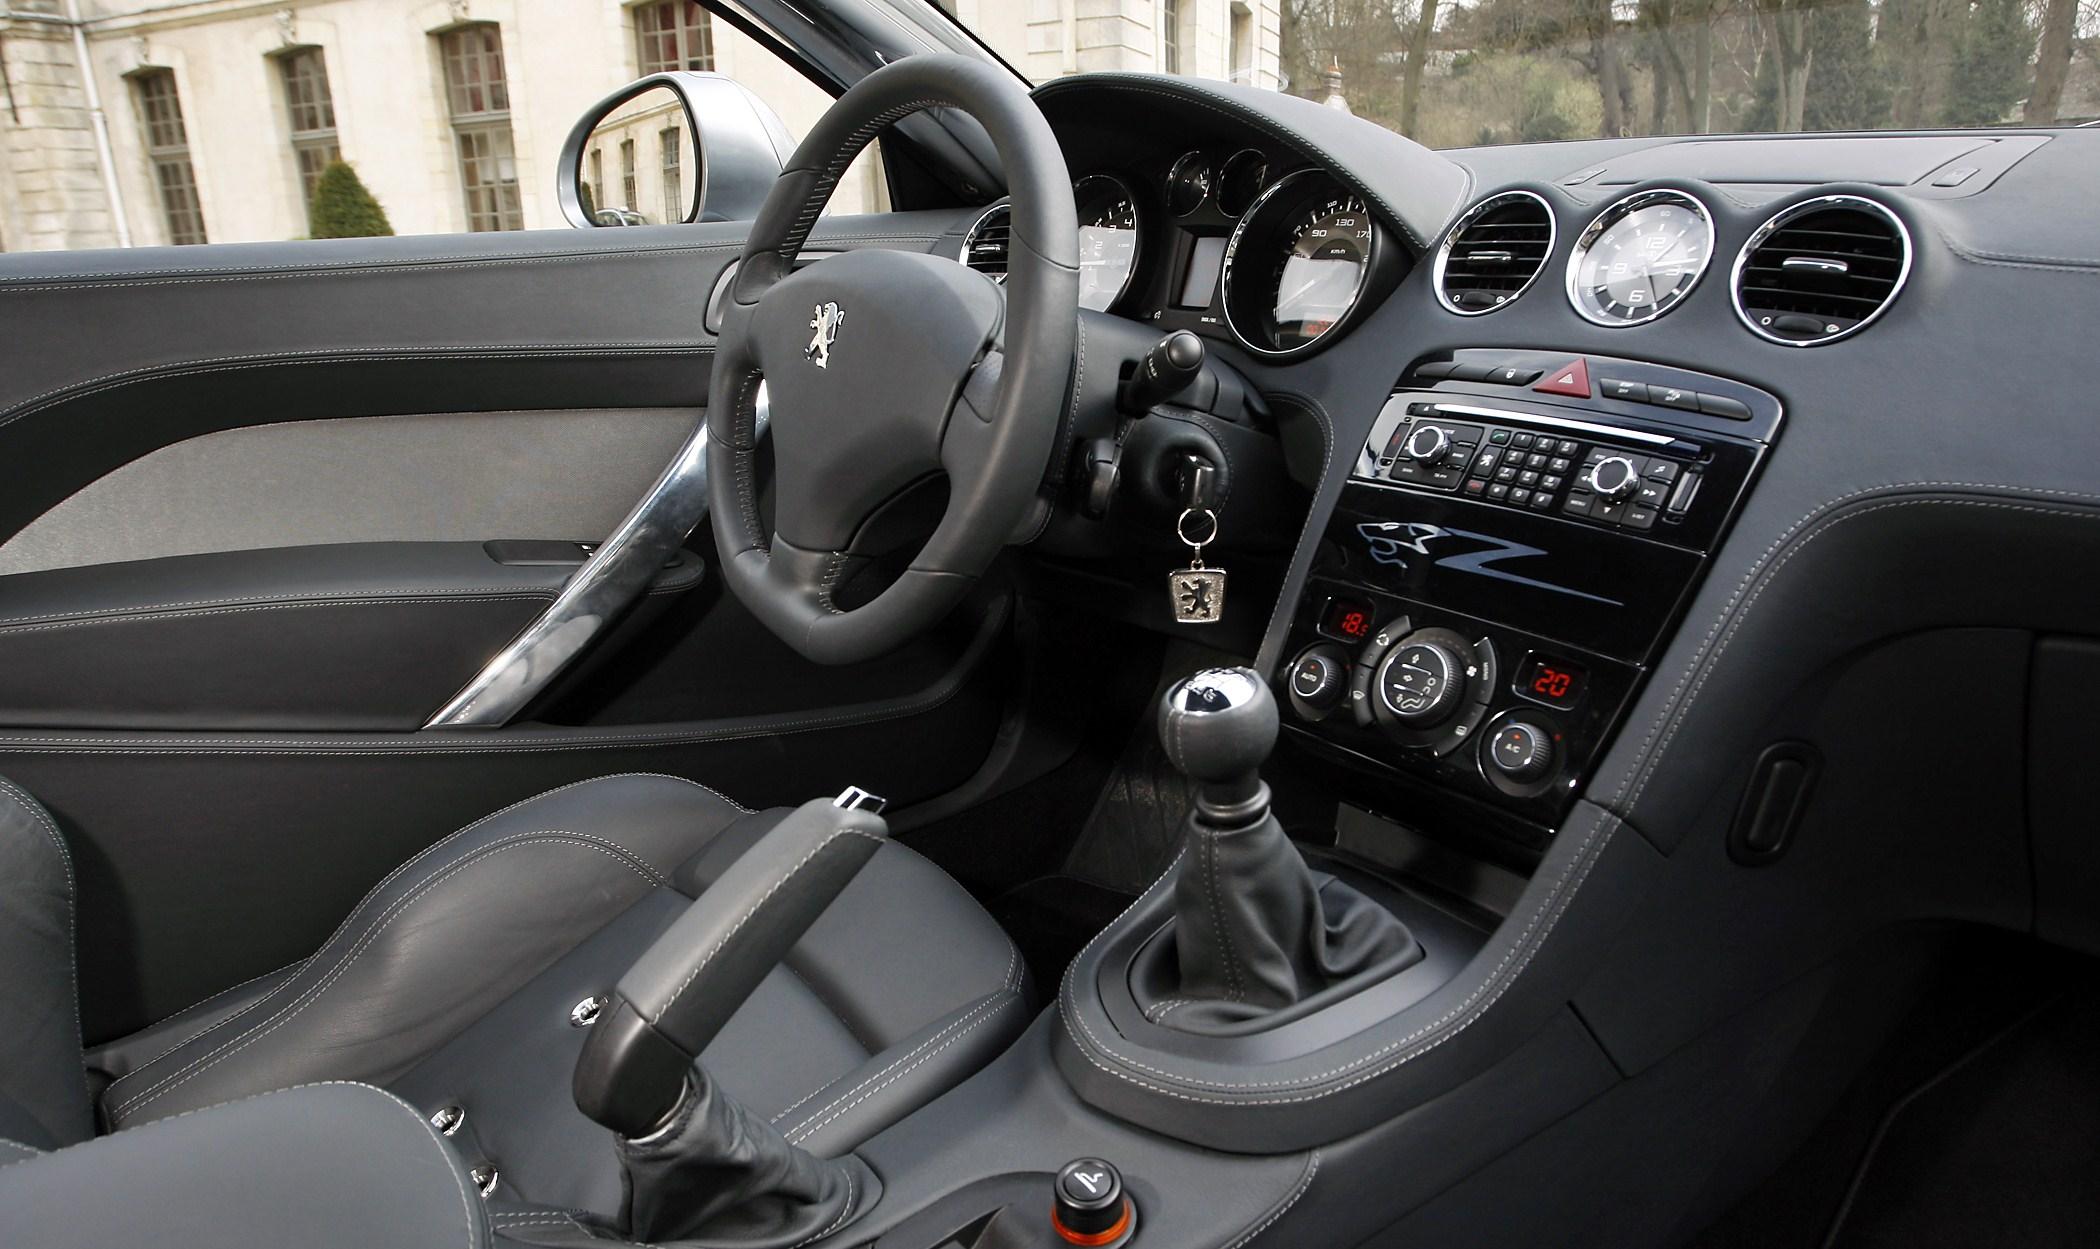 peugeot-308-rcz-11 Automobile Wiring Diagram on